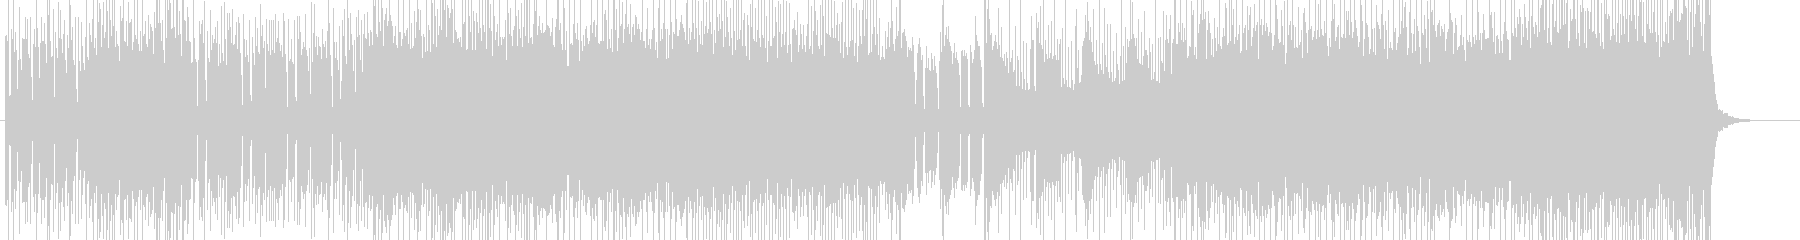 【HARD/HEAVY】DARKROCKの未再生の波形